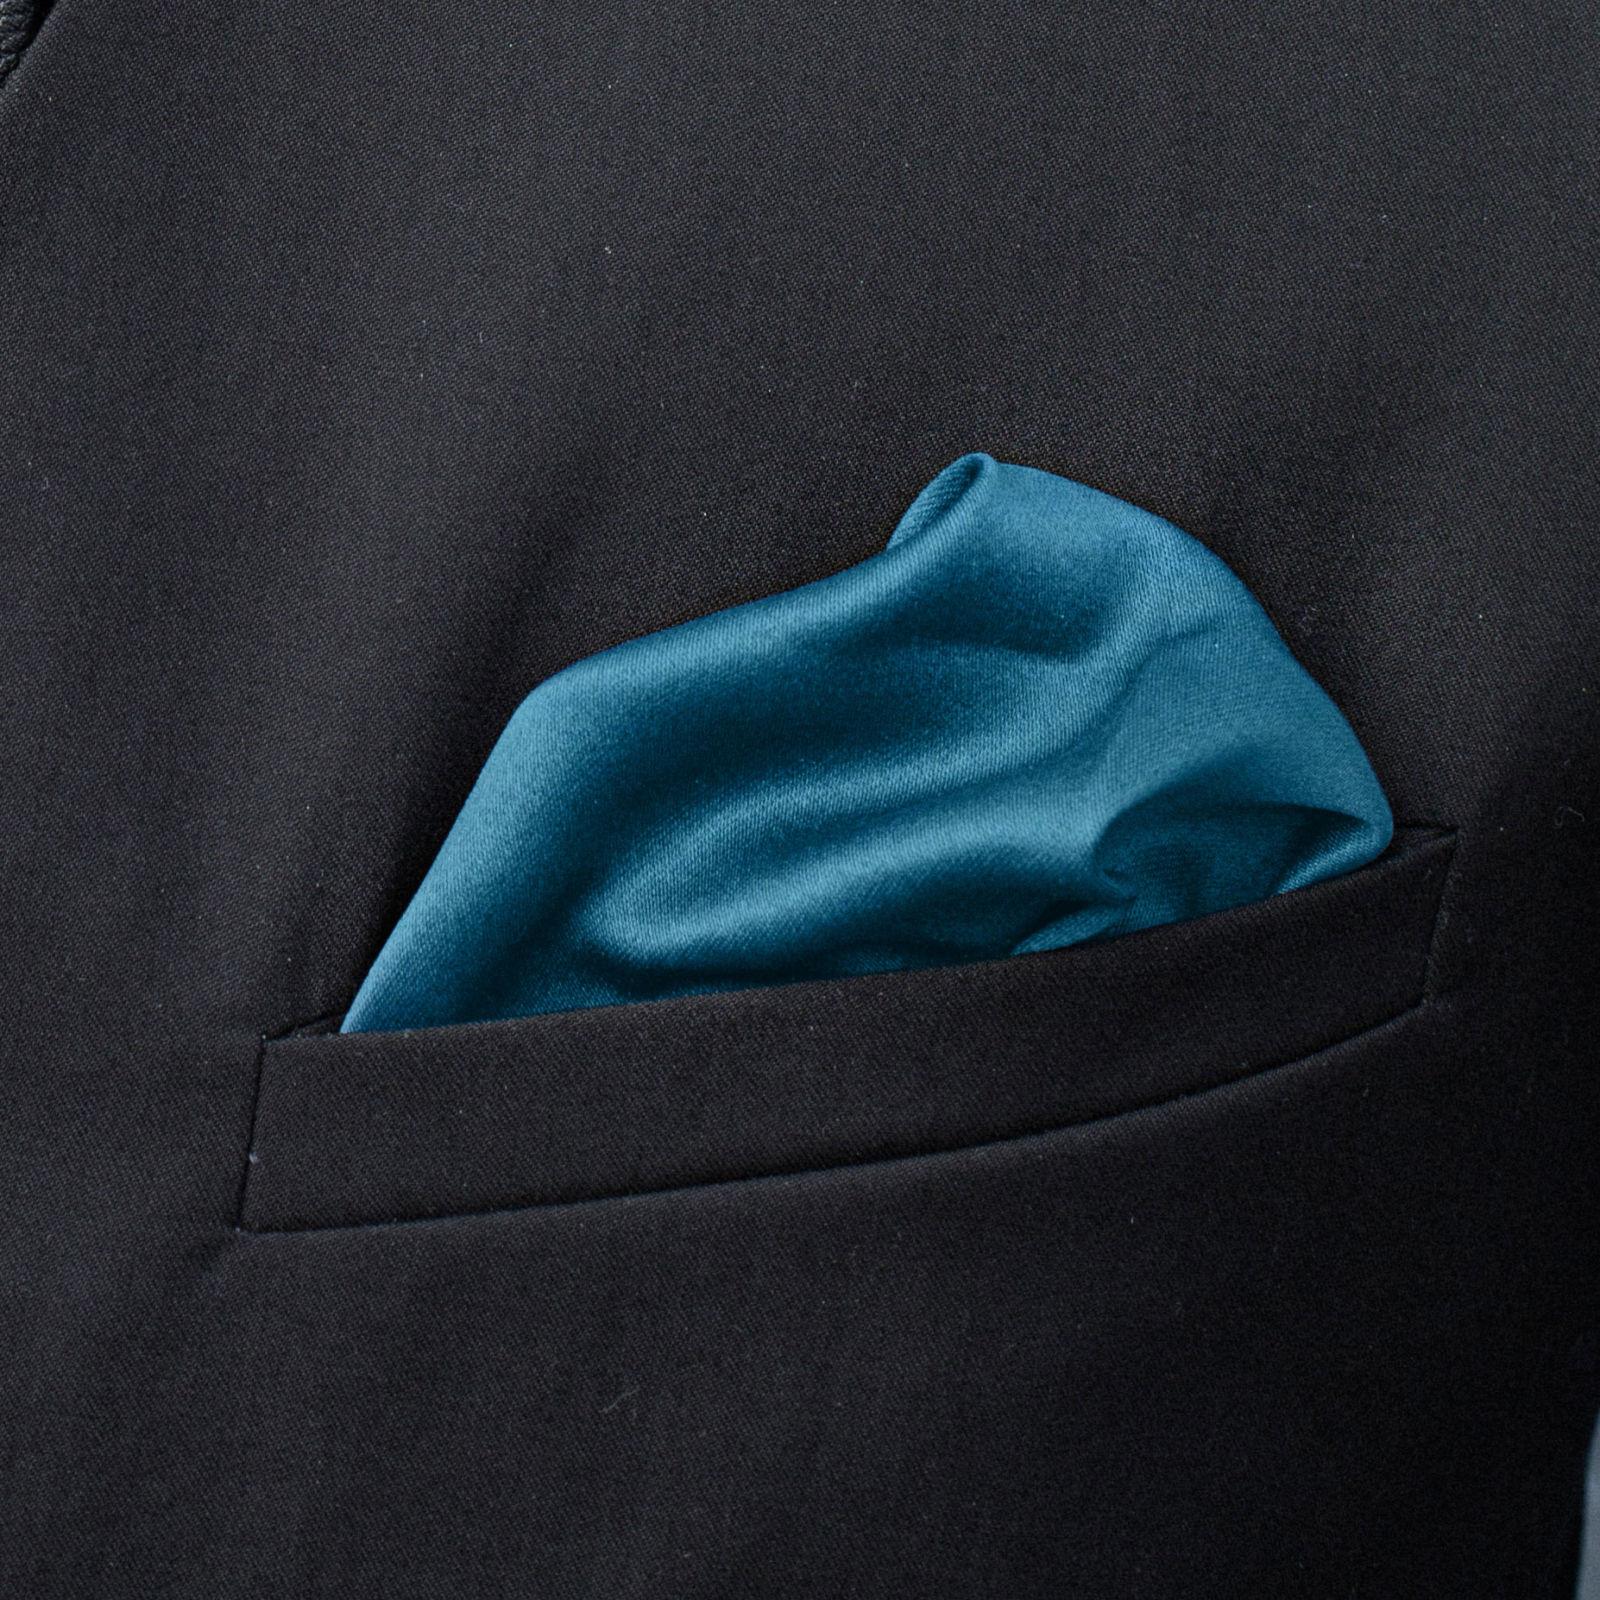 Blue Simple Pocket Square Trendhim cZASktw